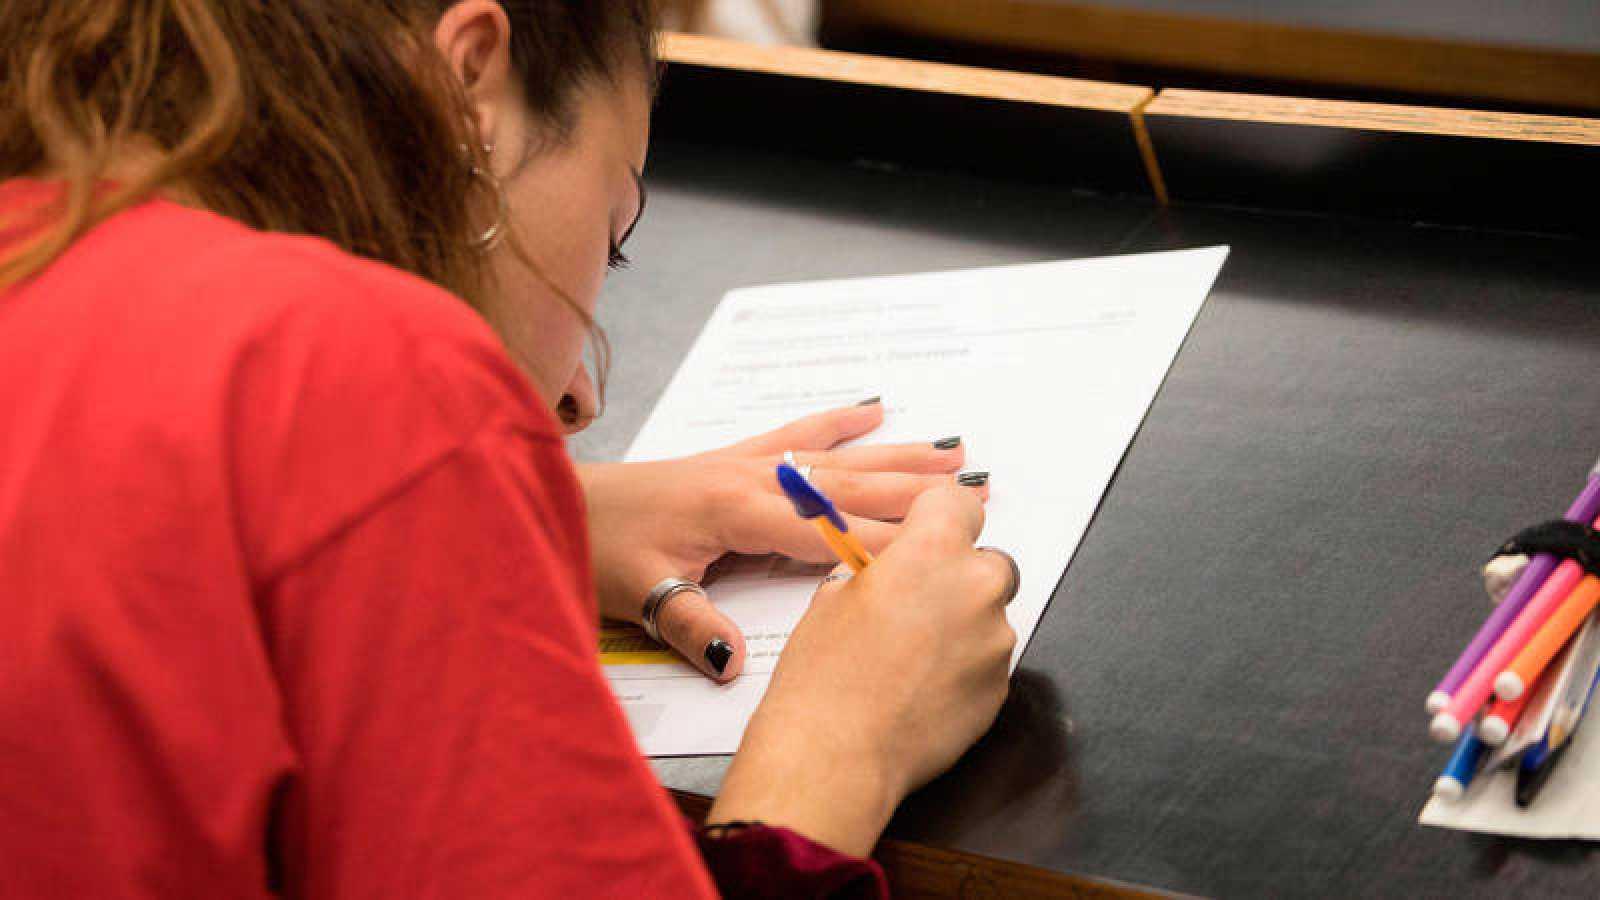 Una estudiante se enfrenta a un examen de la selectividad en la Universitat Pompeu Fabra de Barcelona